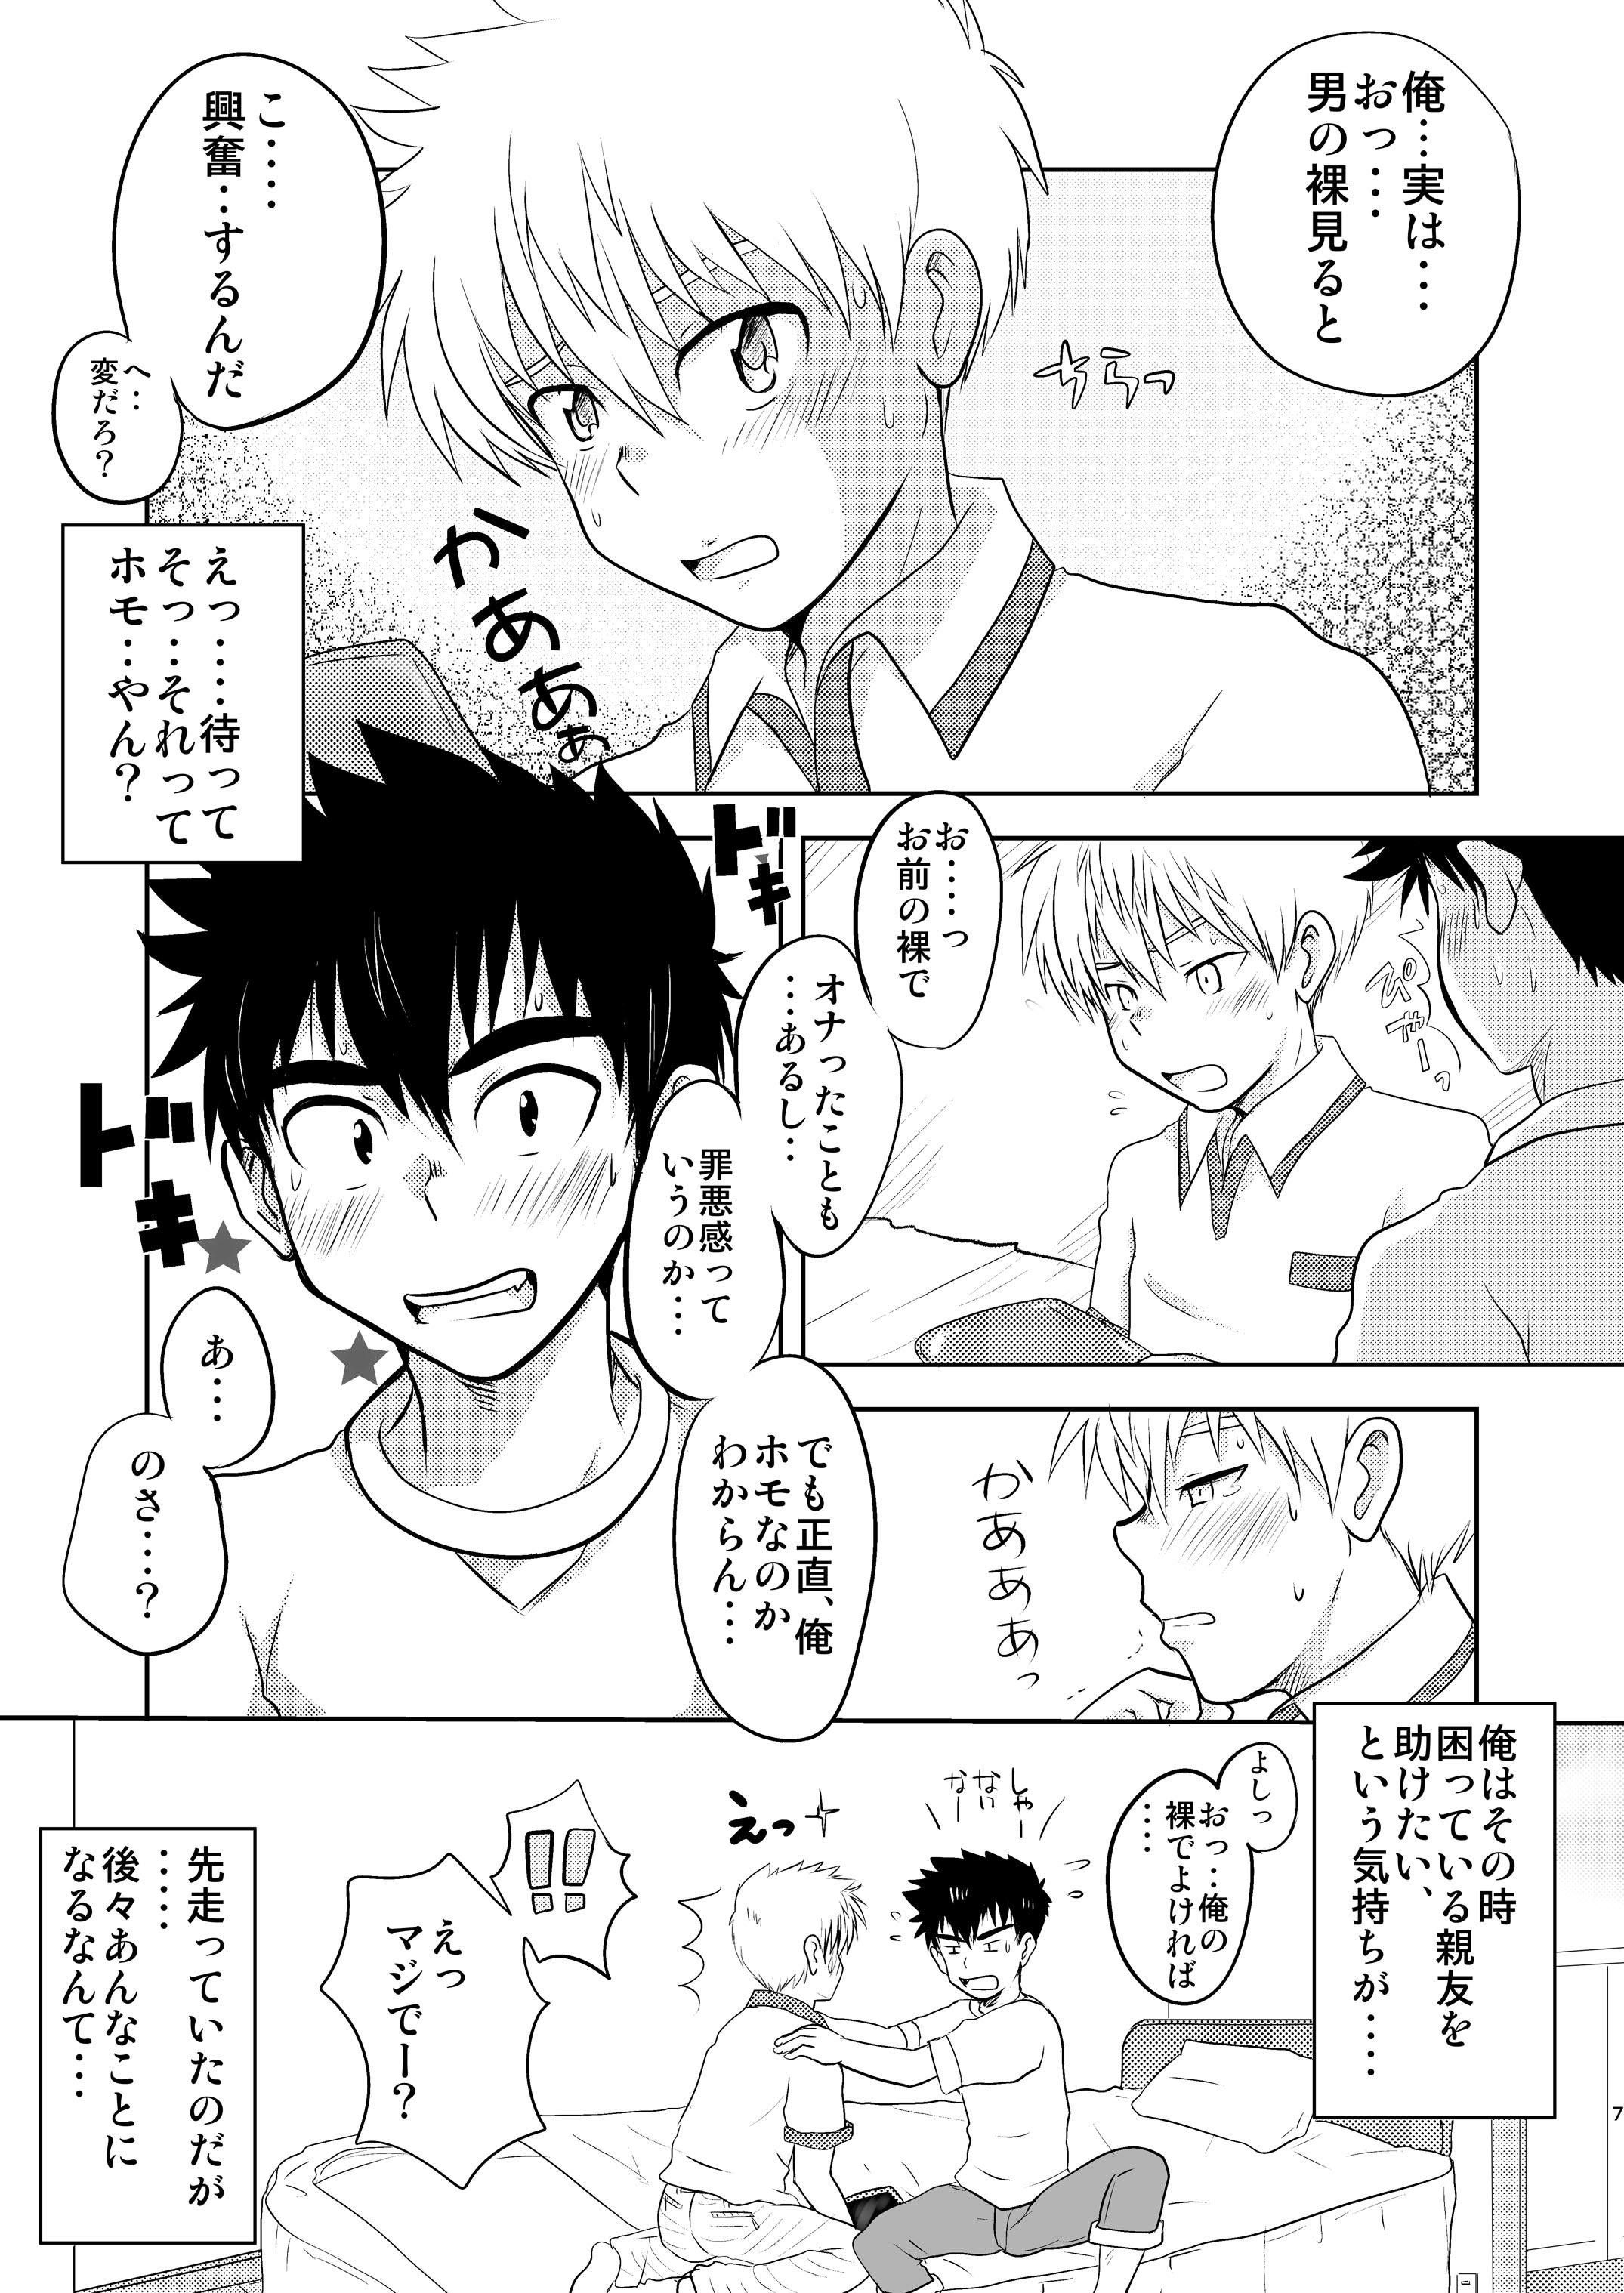 Ikenai! Ikenai! Omae ja Nai to..! 6